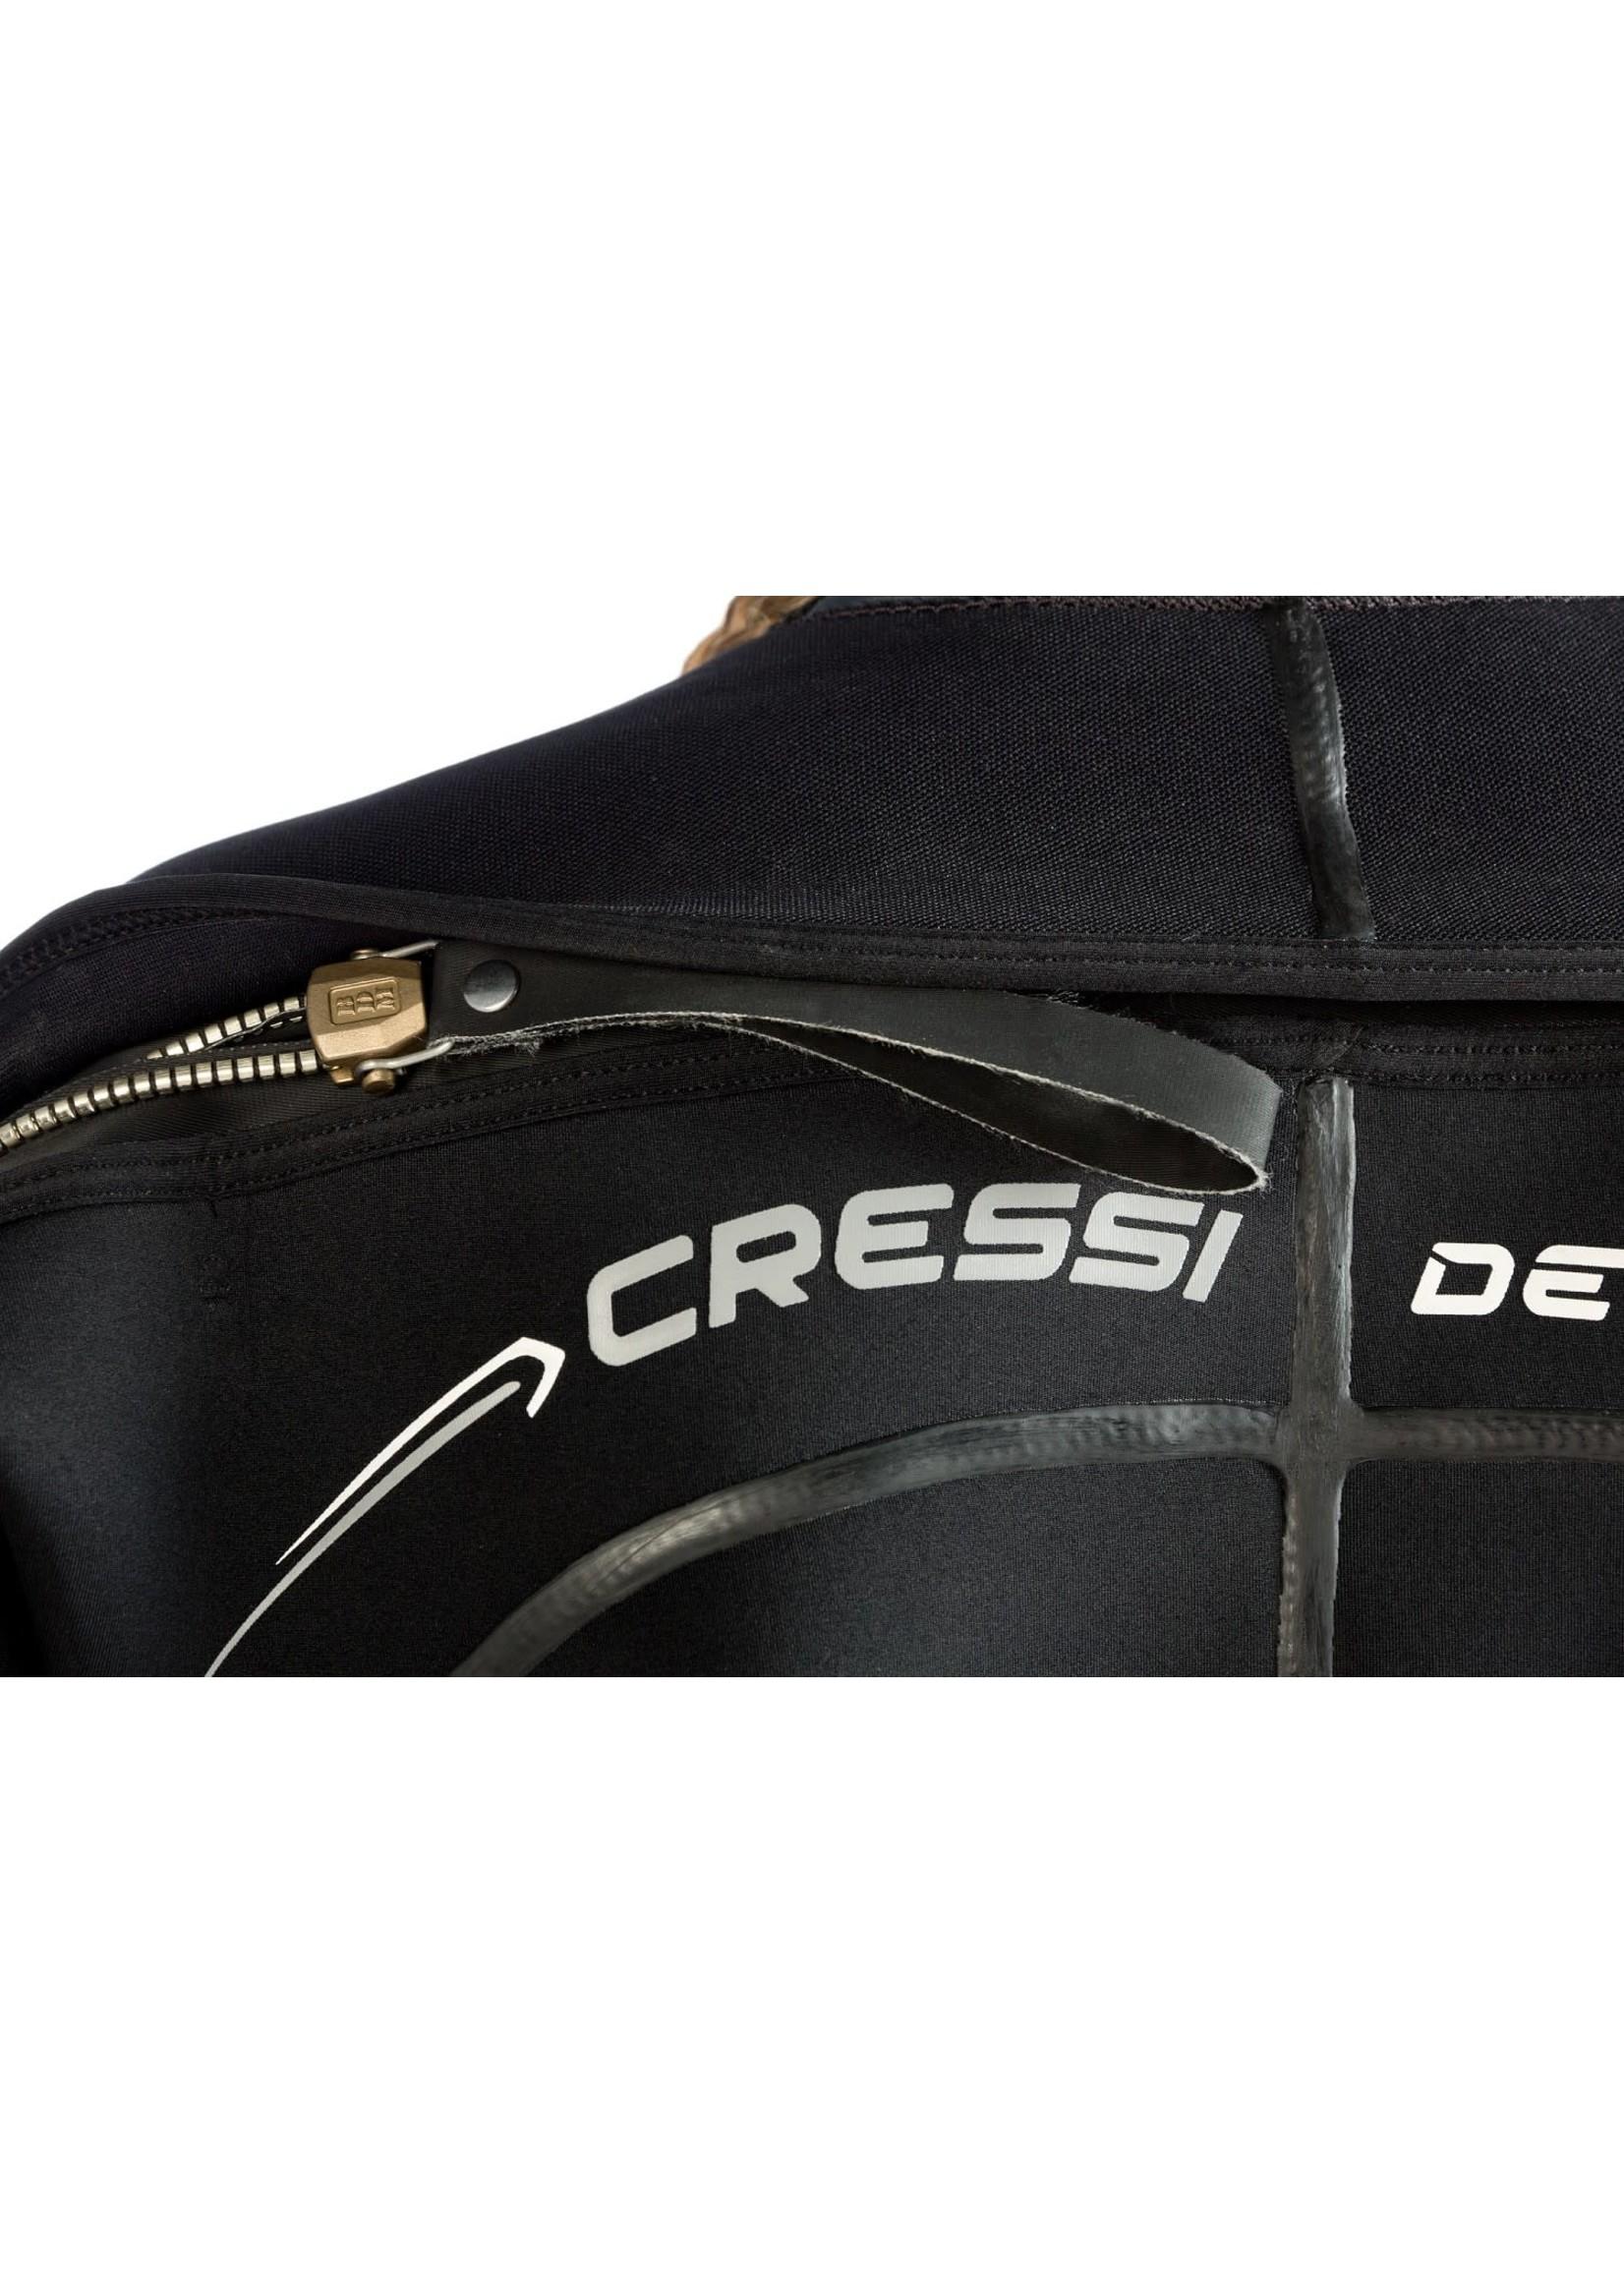 Cressi Cressi Atelier Desert All-in-One 4mm HD - vrouw